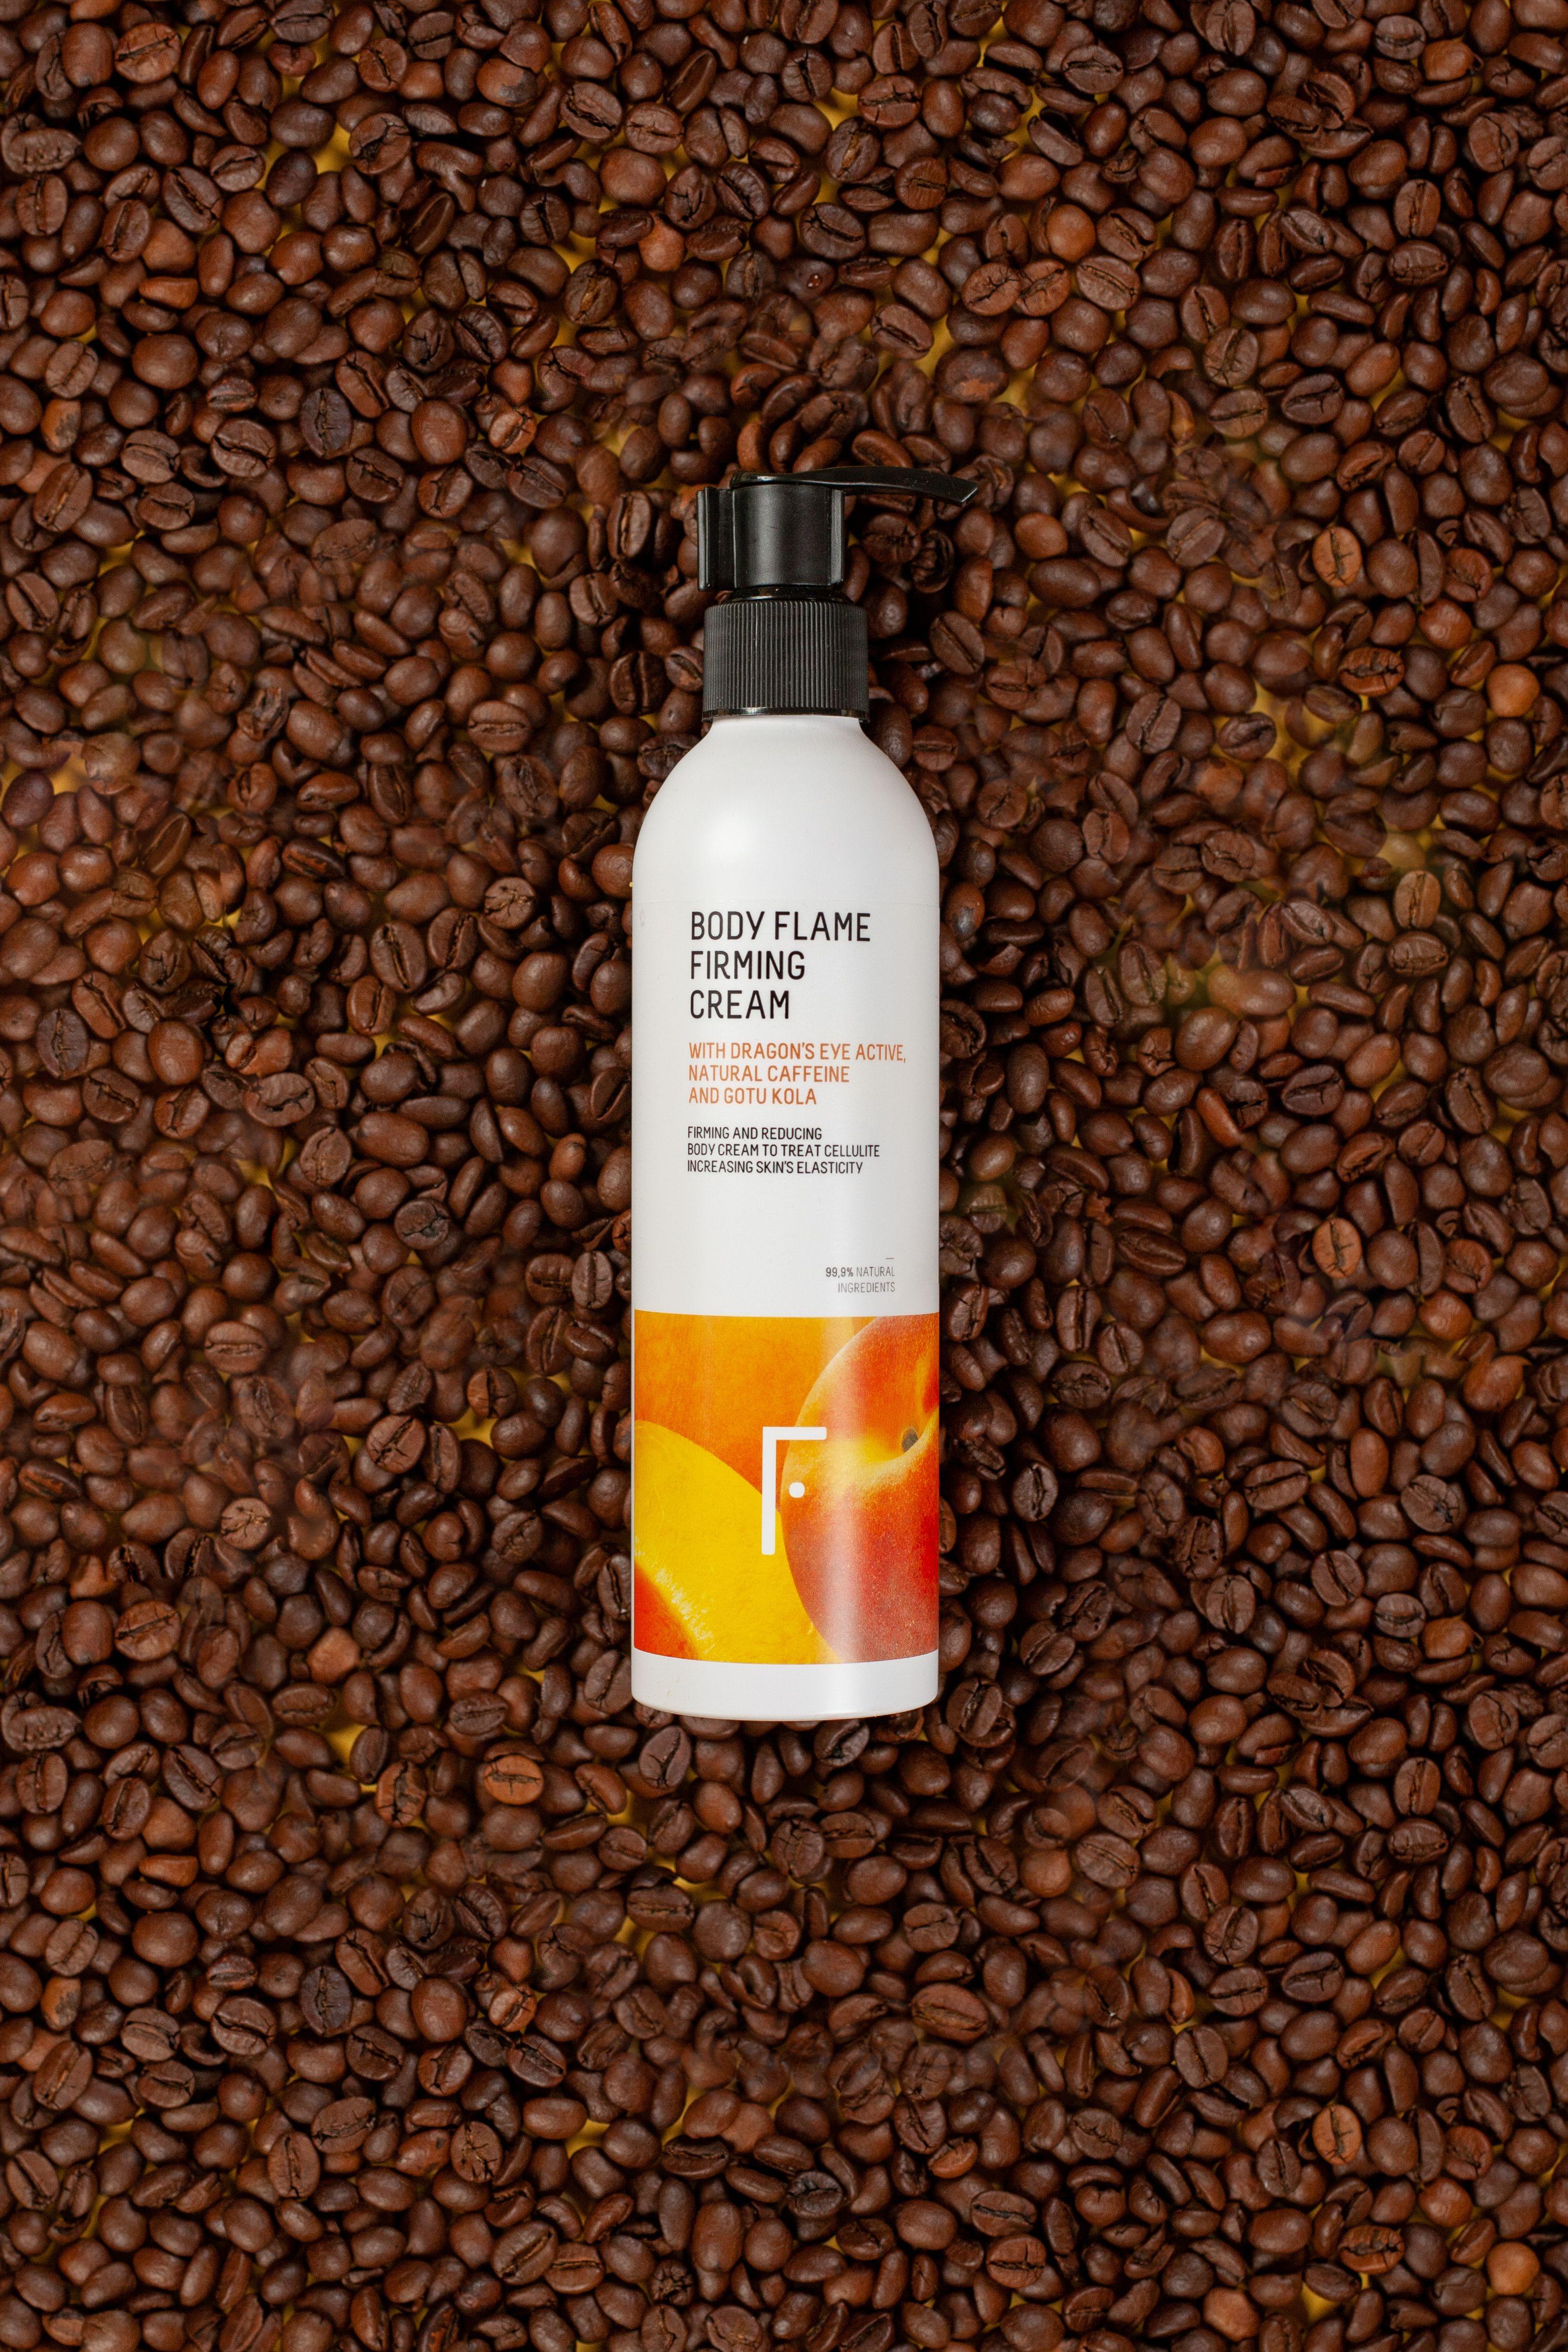 Body Flame Firming Cream Crema Corporal Reafirmante Crema